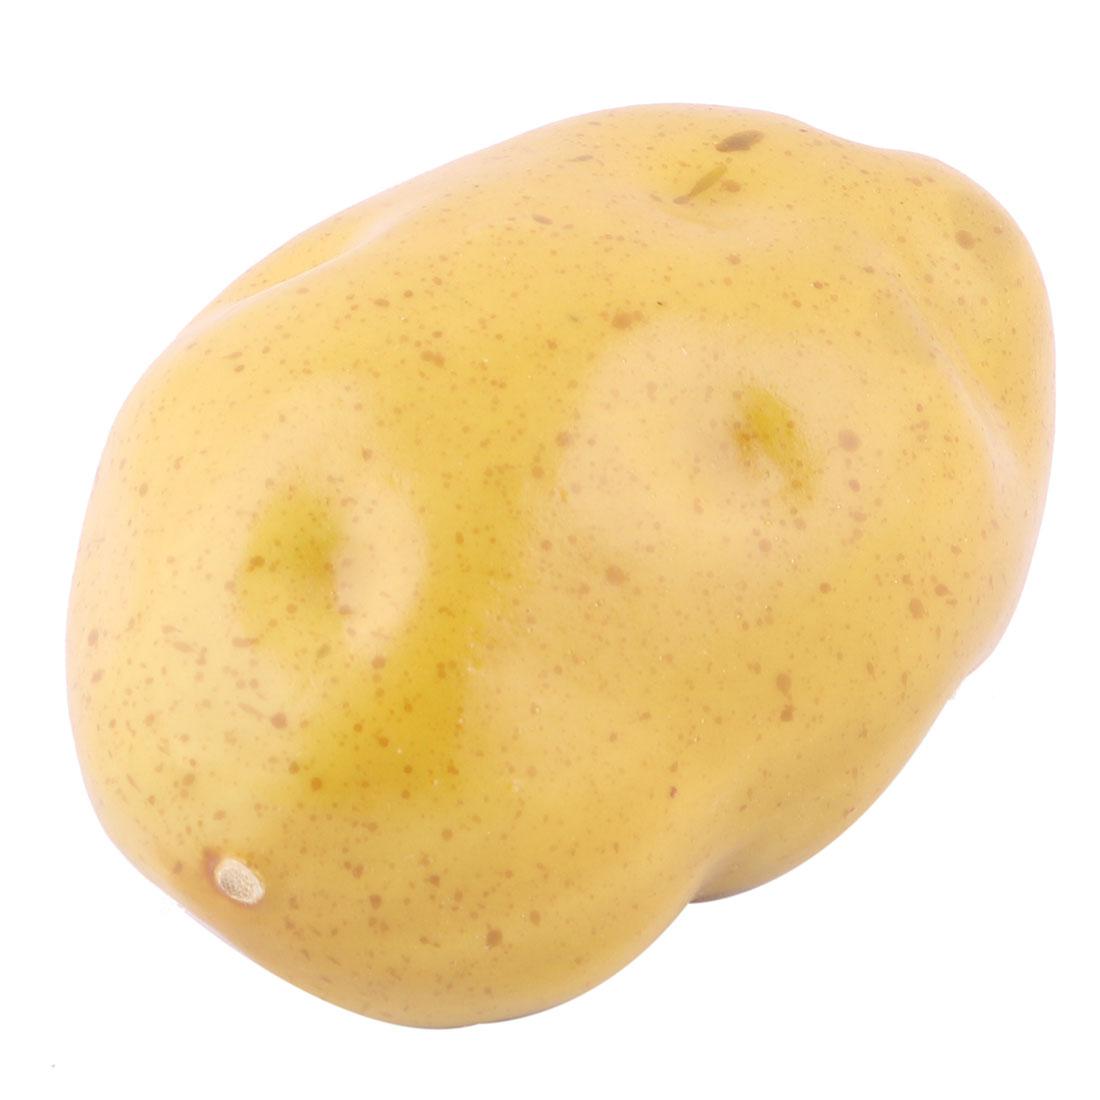 Family Kitchen Decor Artificial Potato Designed Emulation Vegetable Light Brown